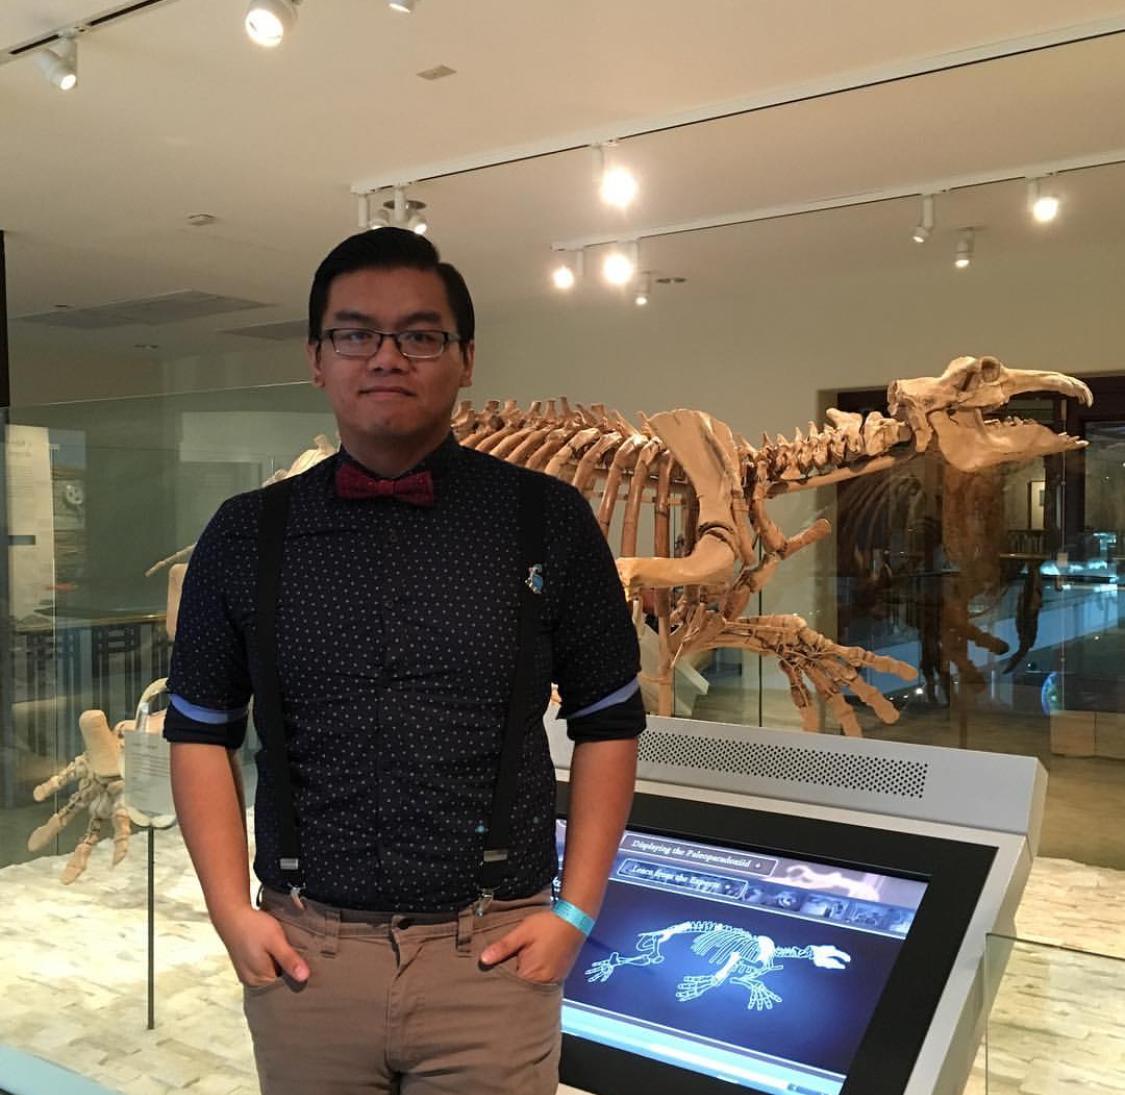 Gabriel-Philip Santos  @paleoparadox Specialty: Paleontology/Education